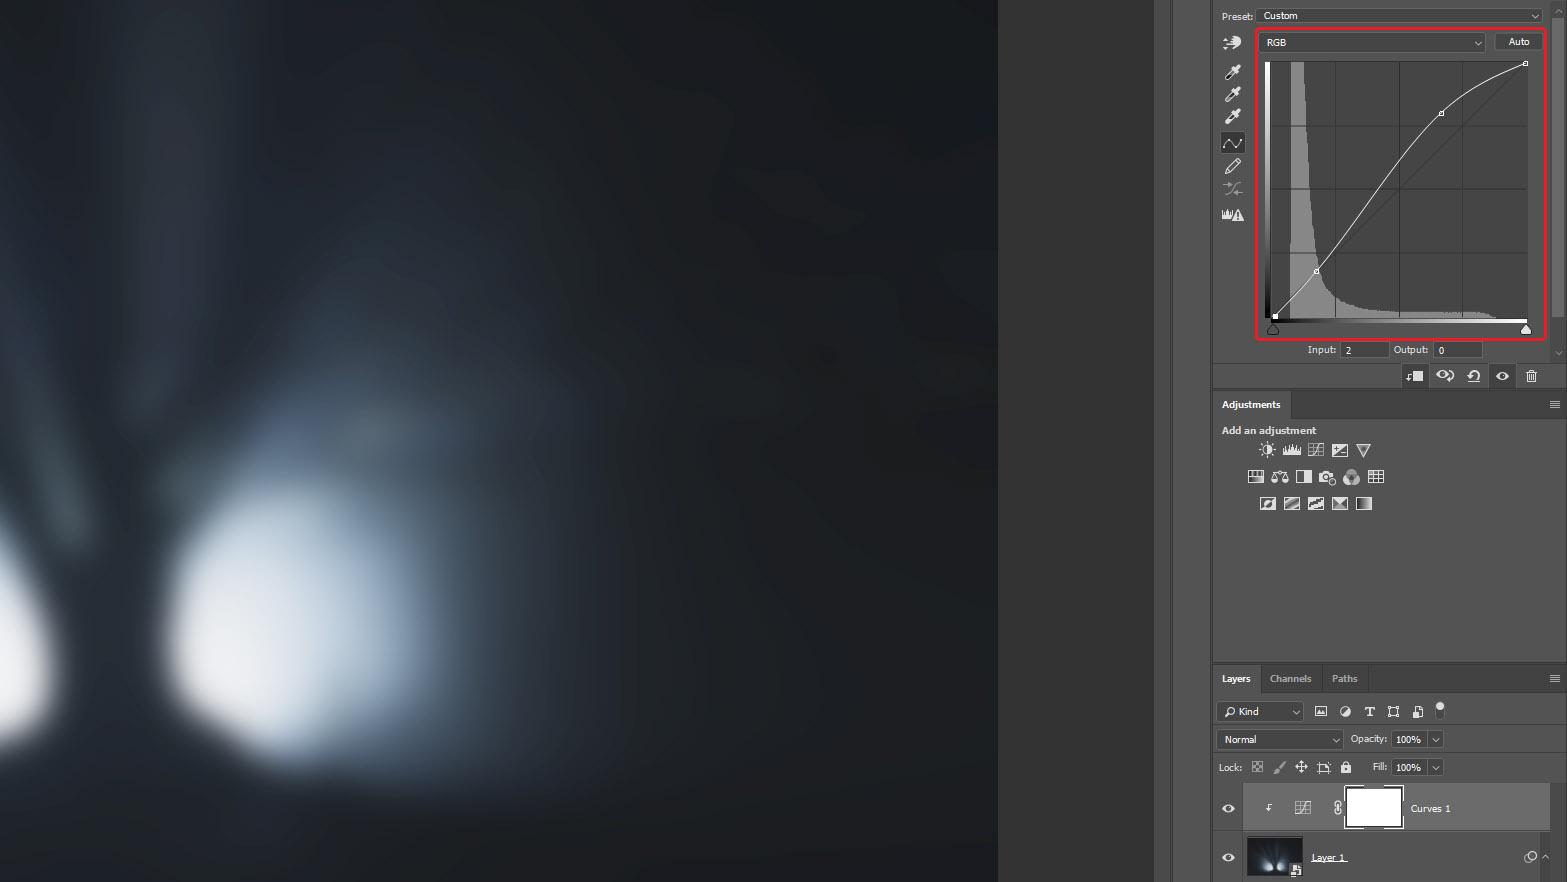 07-curves-contrast.jpg